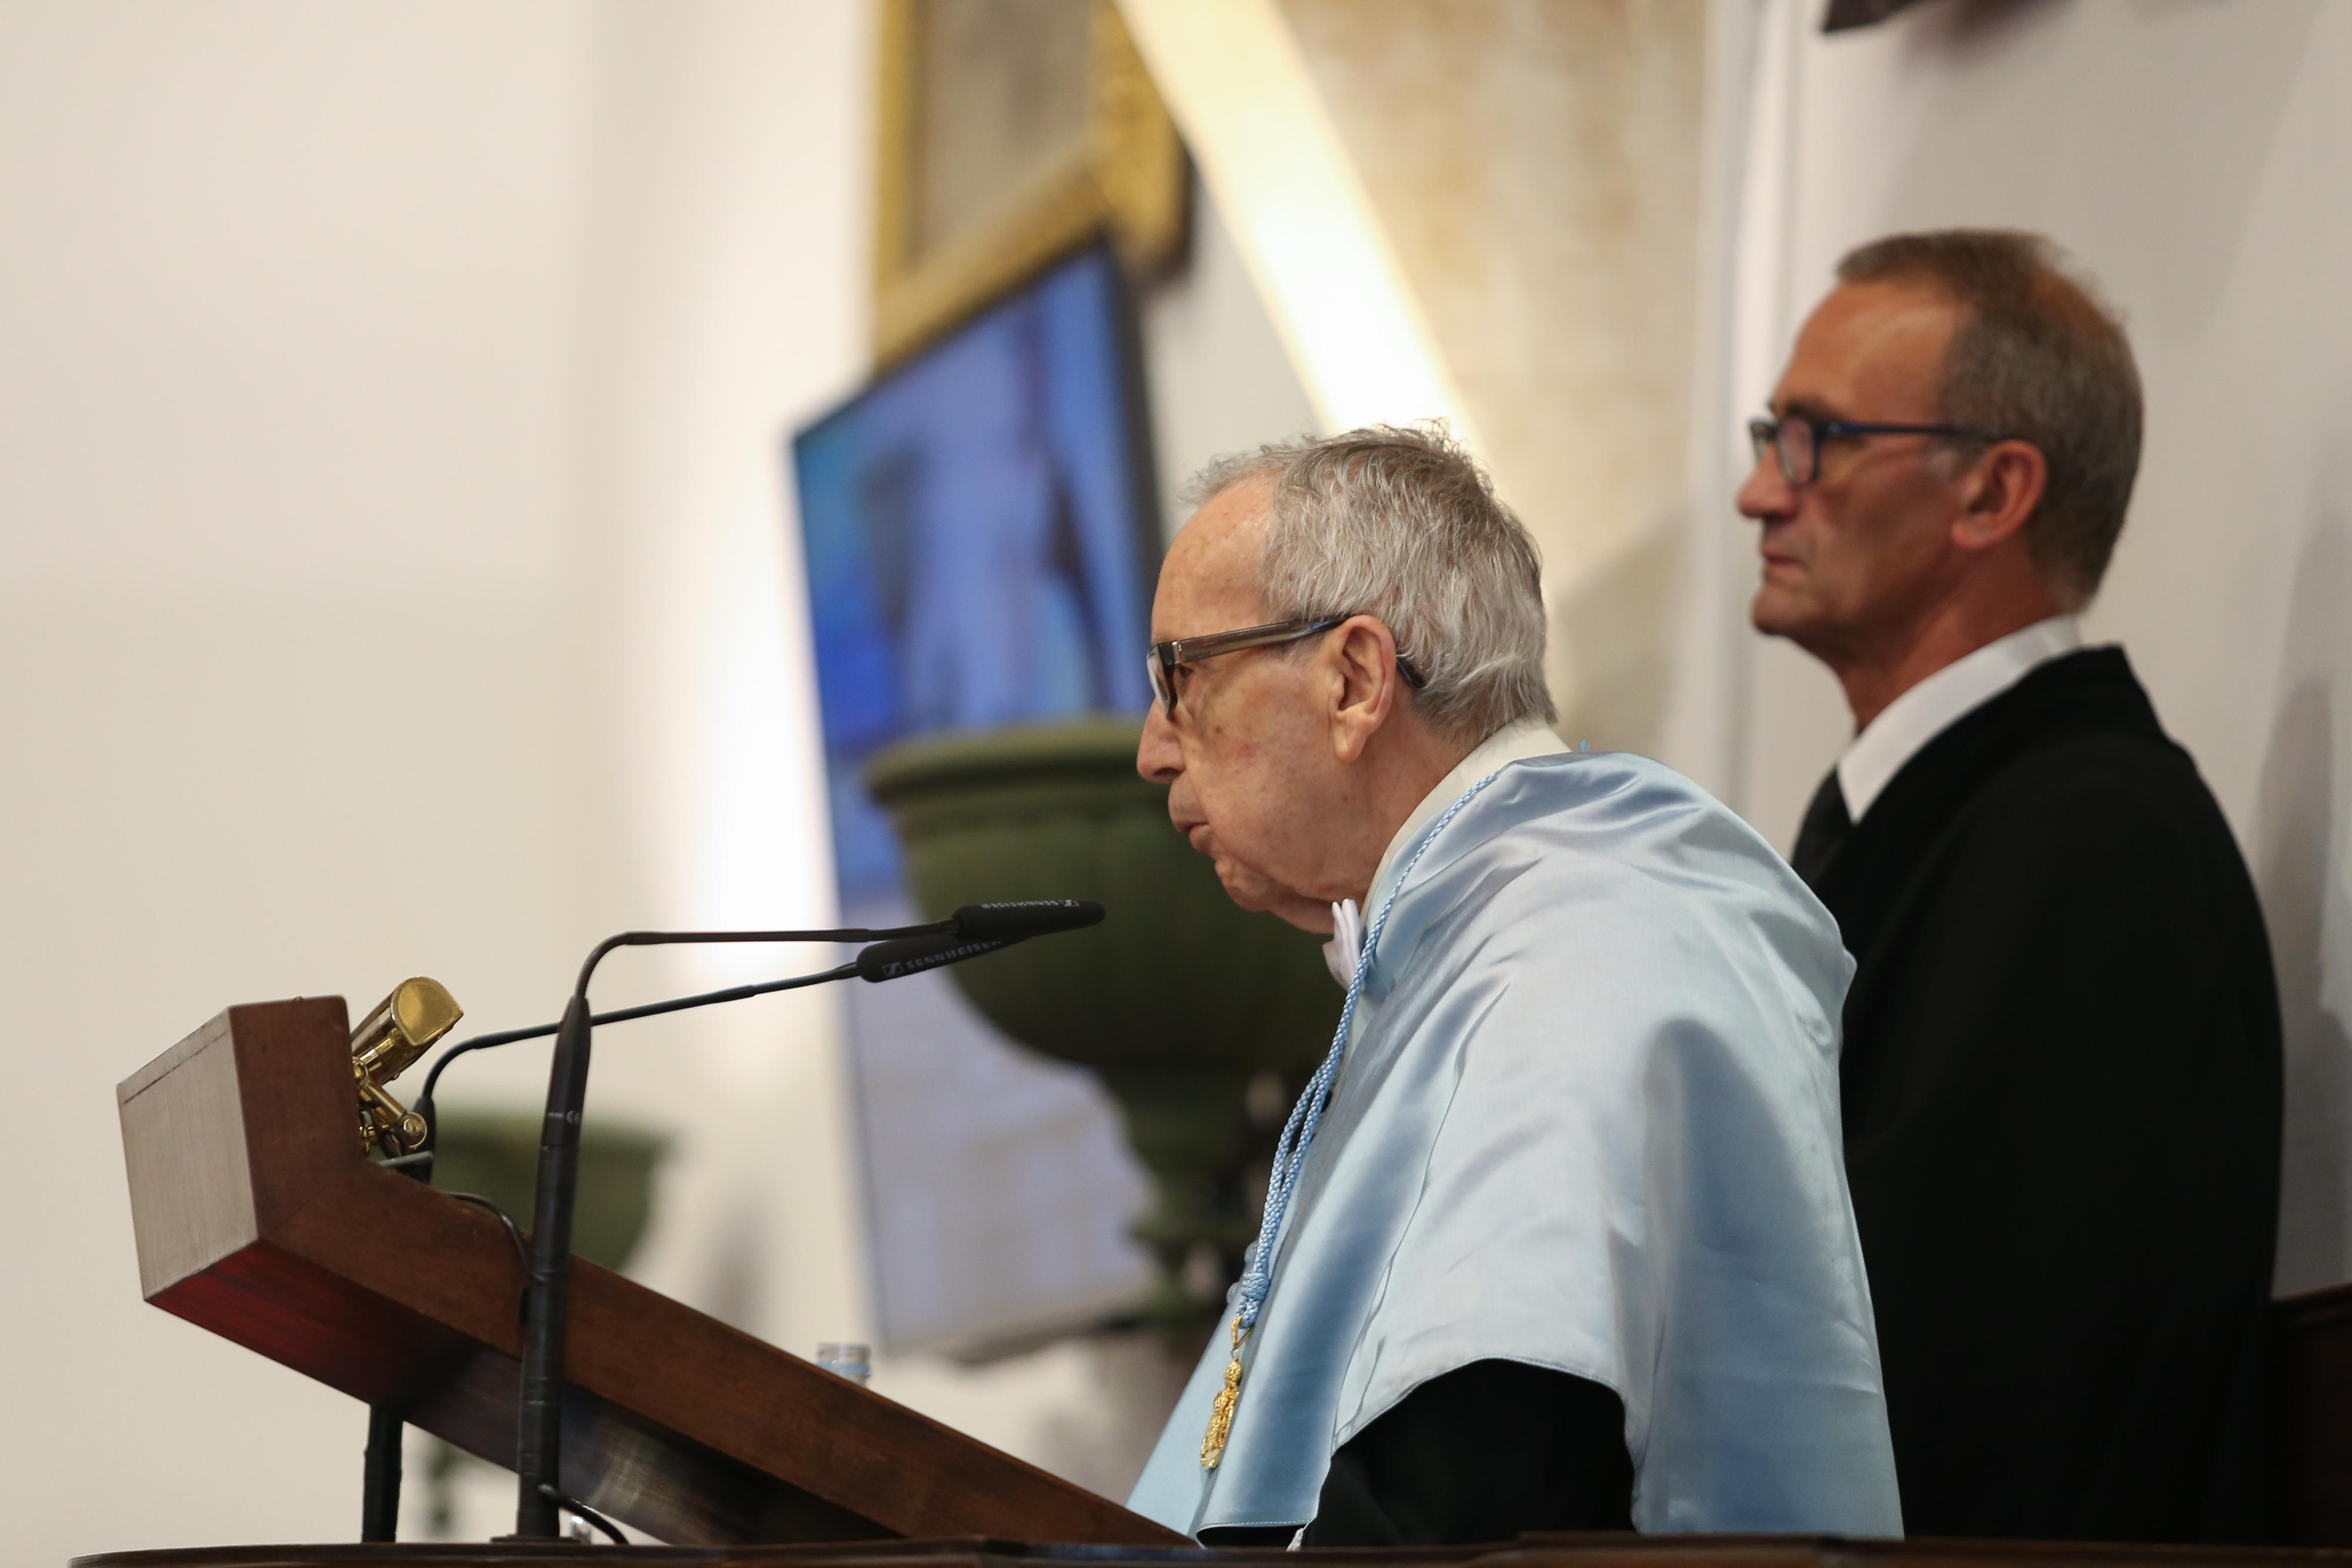 La Universidad de Salamanca inviste doctor honoris causa al poeta cordobés Pablo García Baena